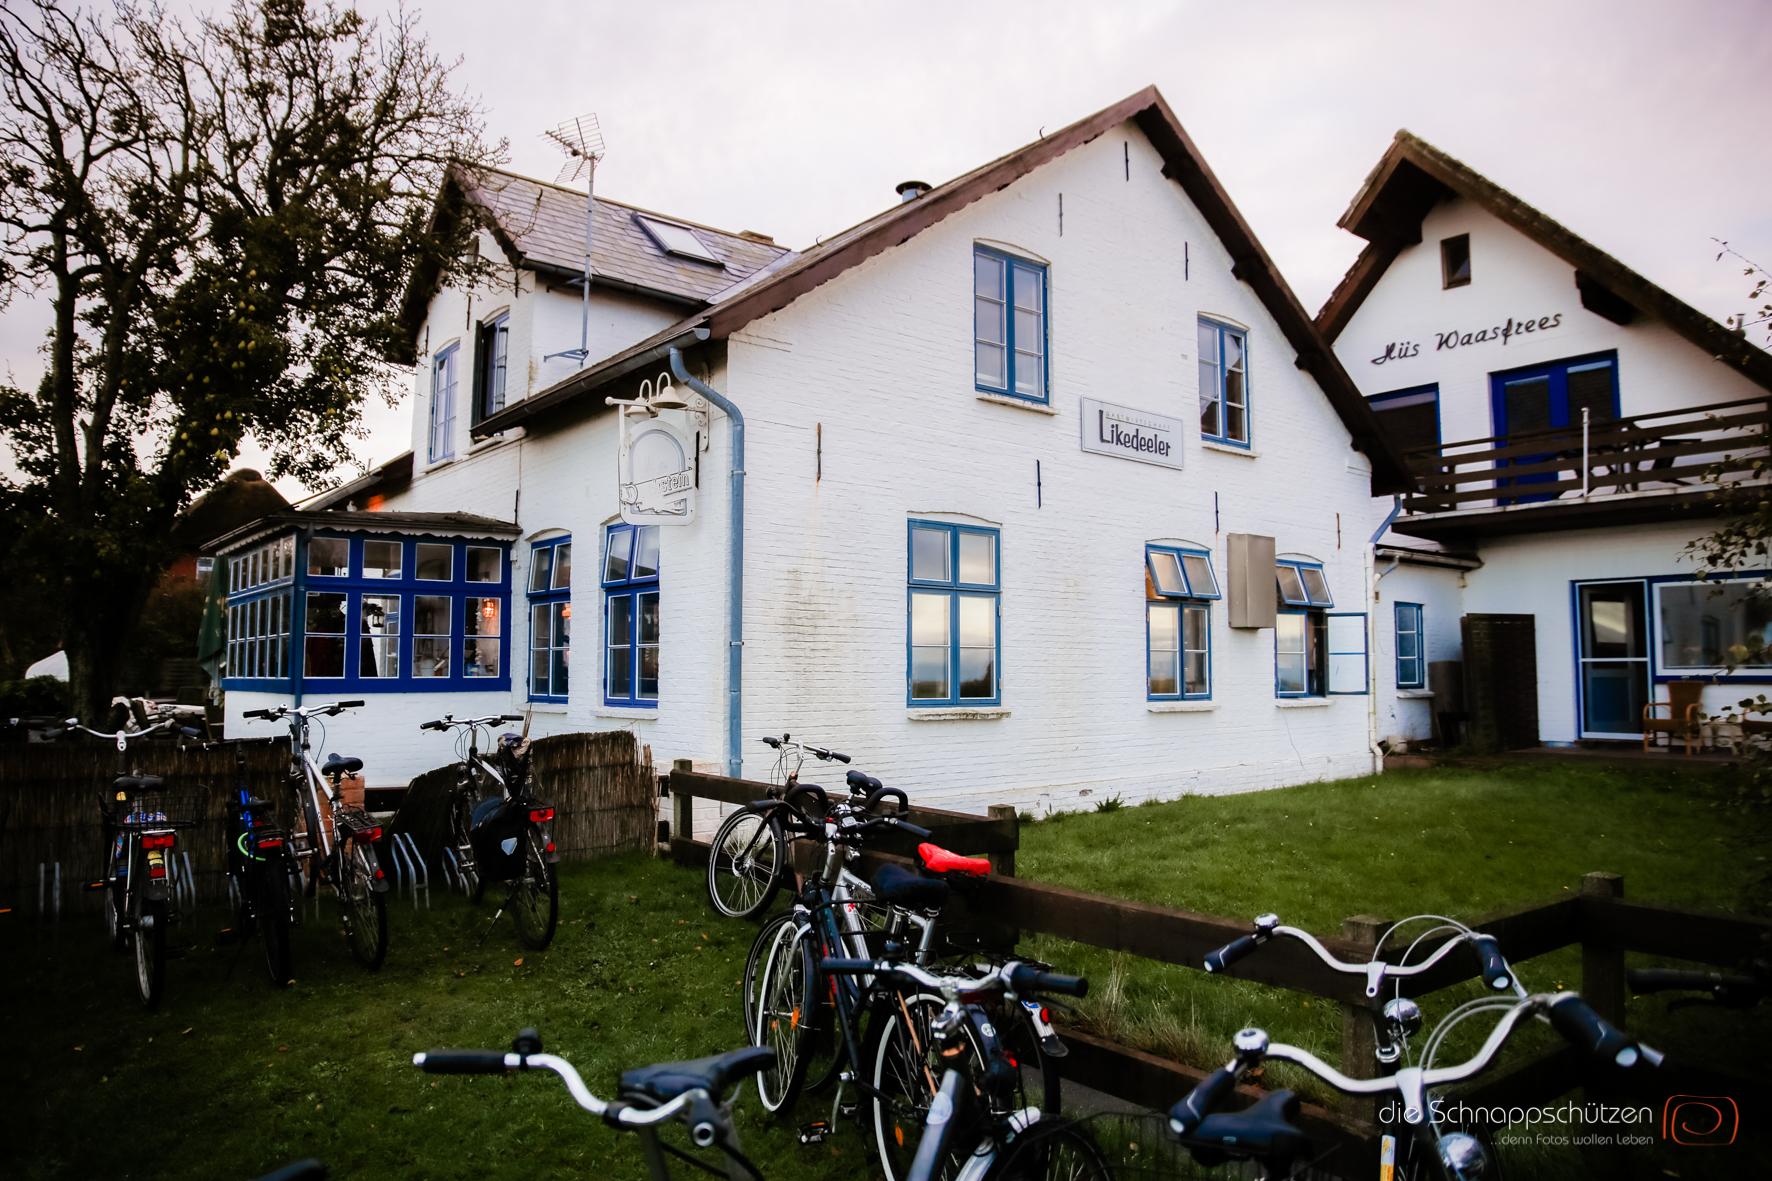 Restaurant Likedeeler auf Amrum